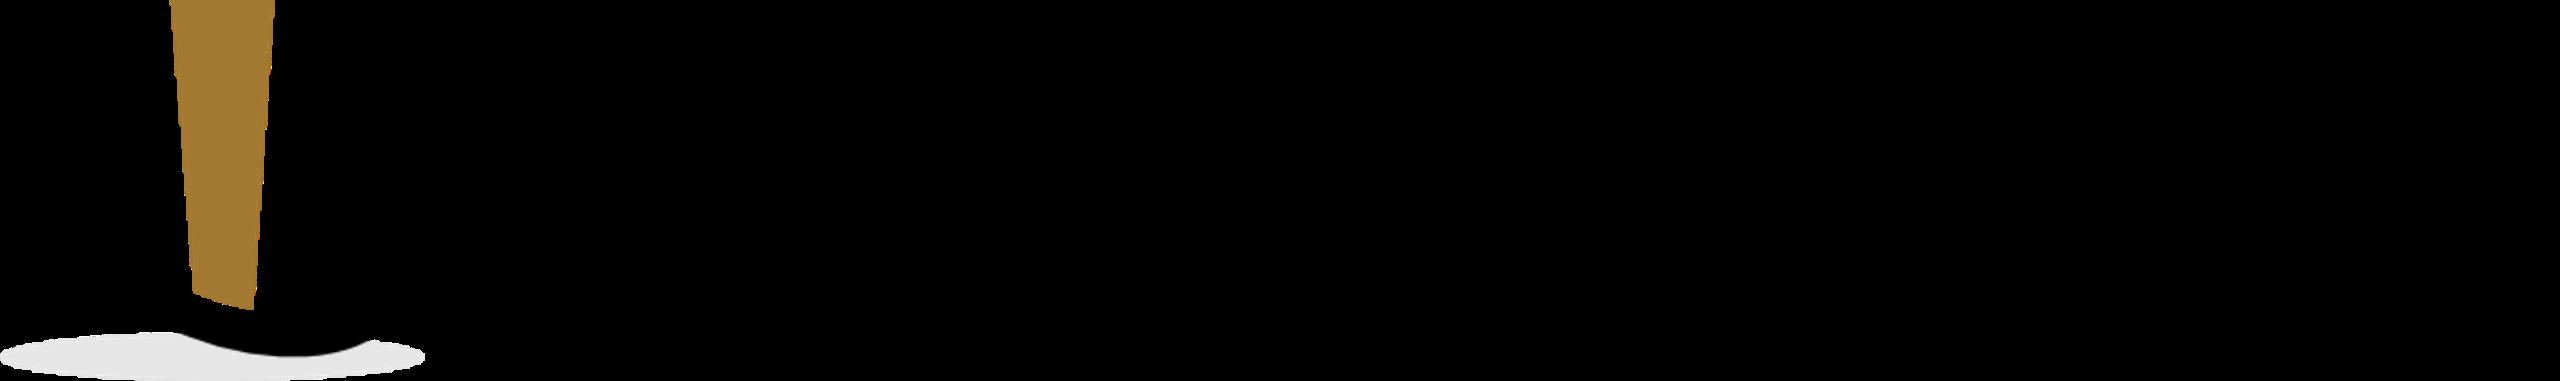 215is